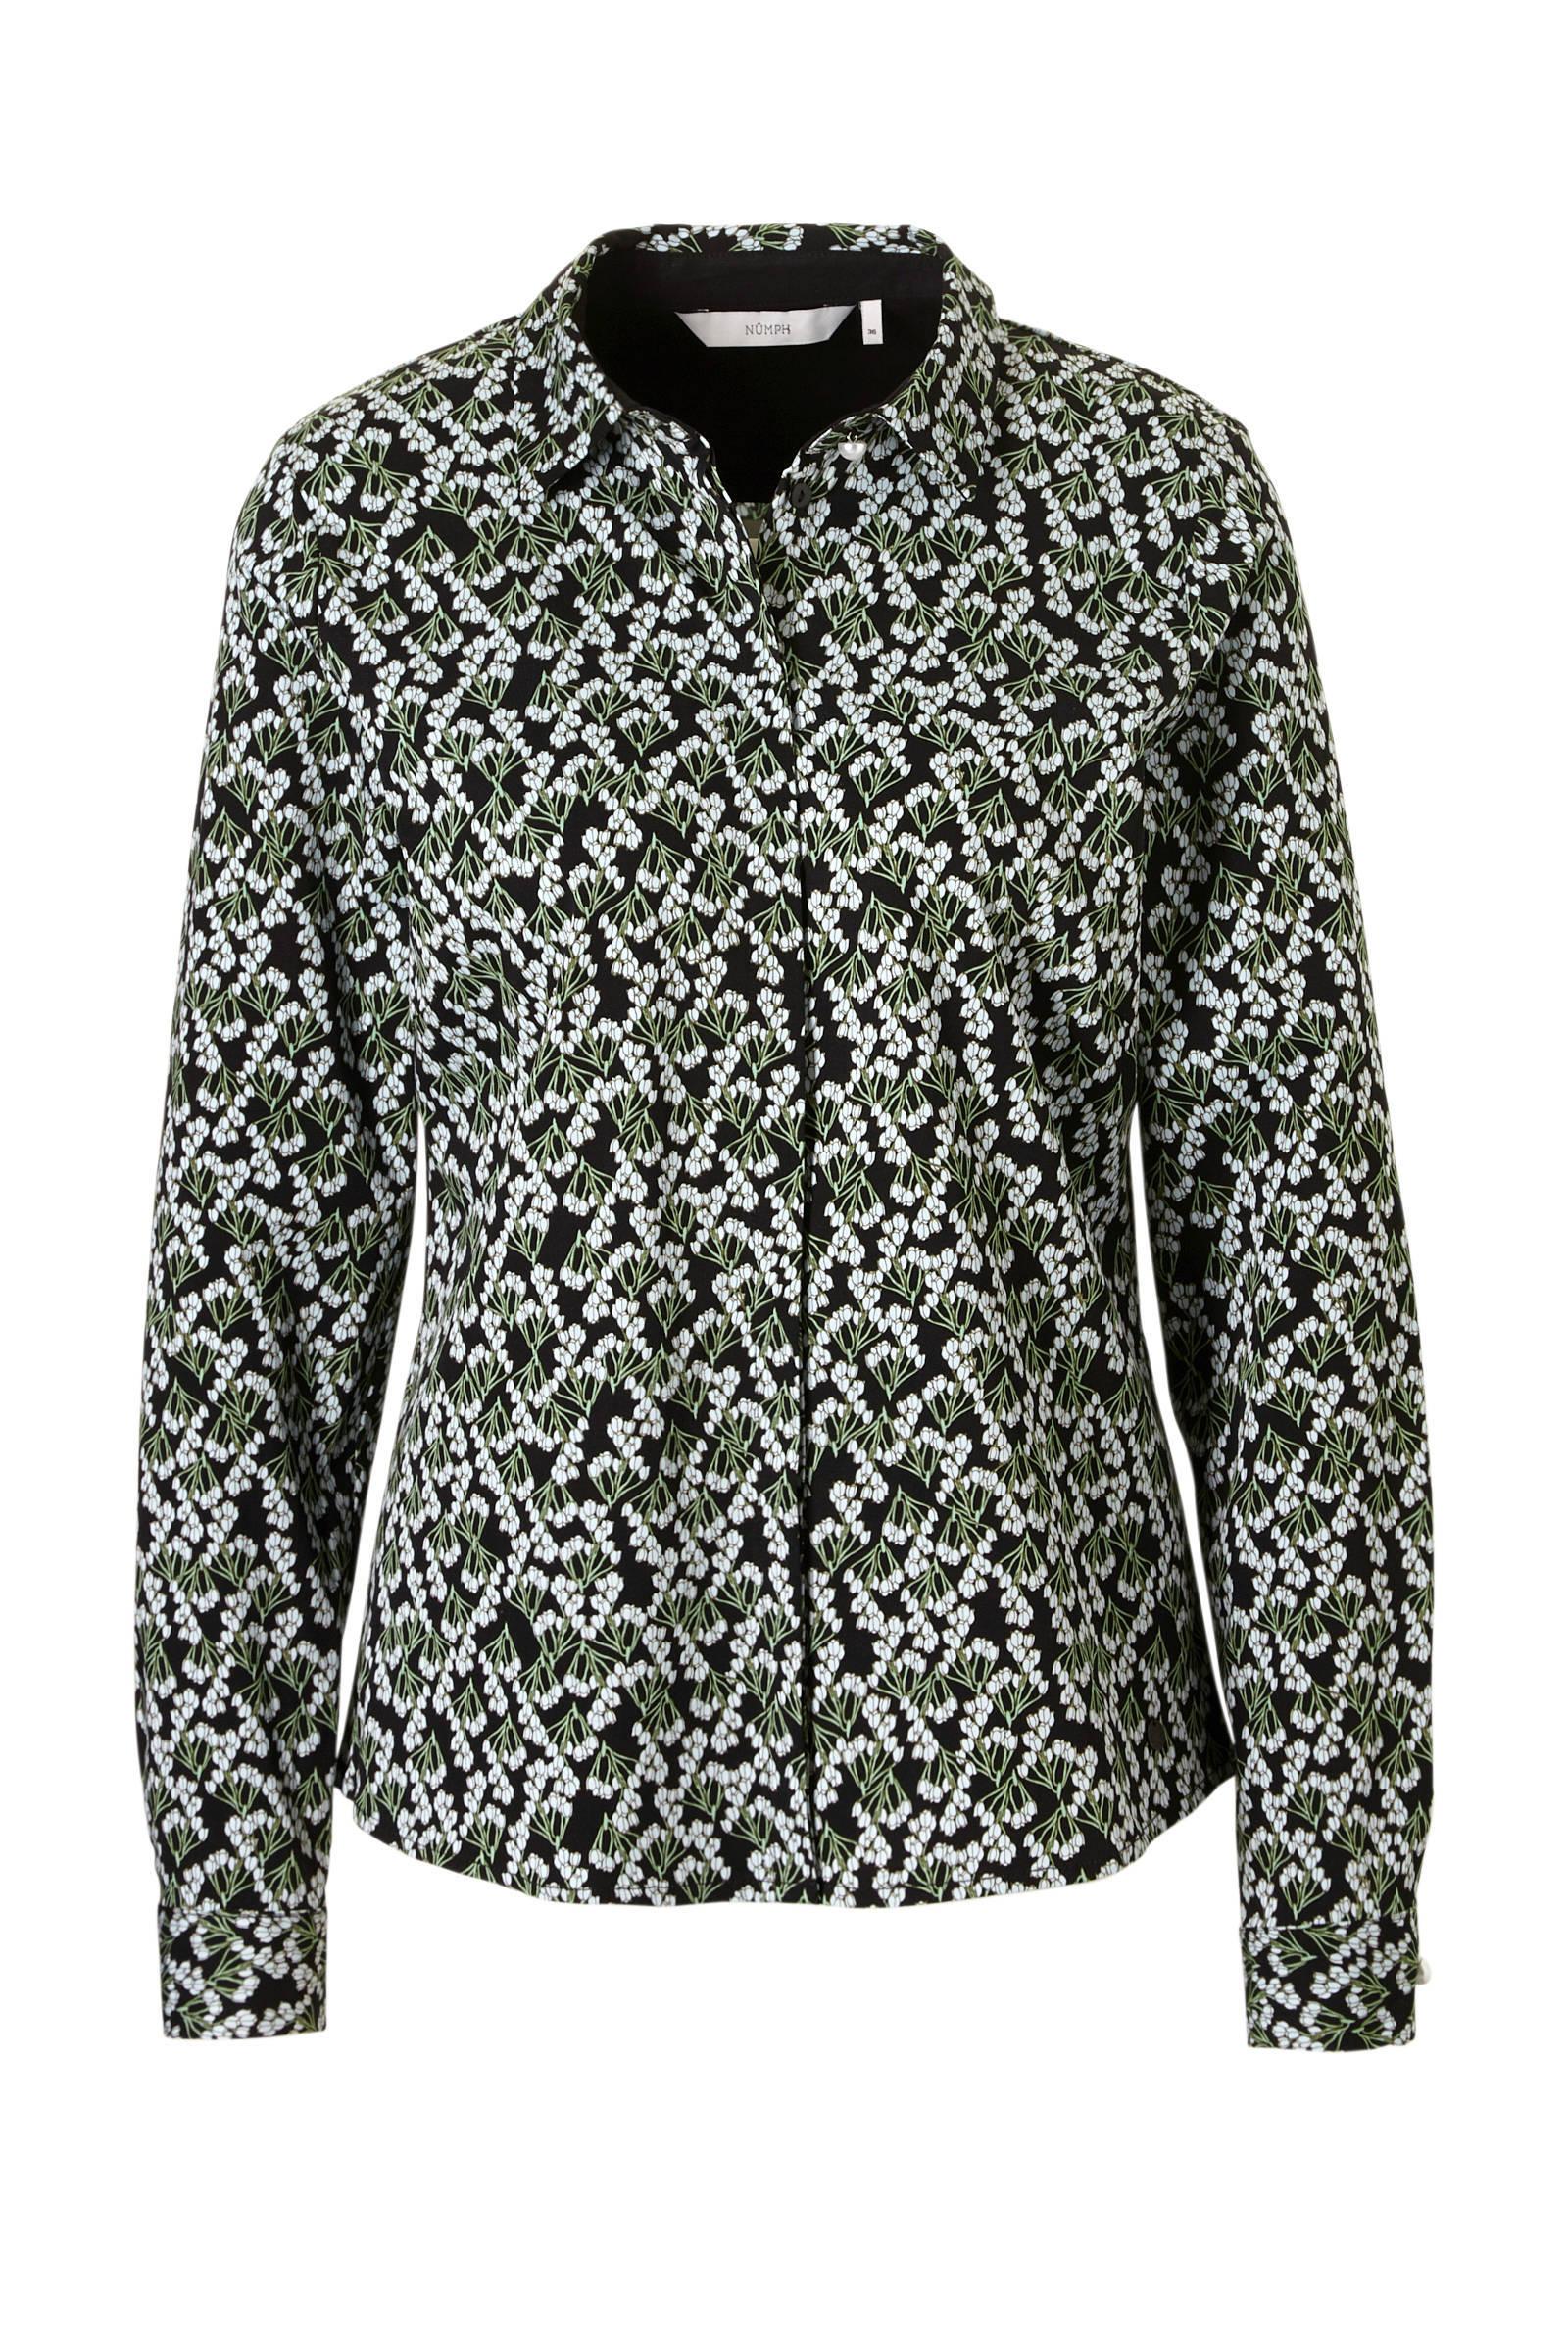 ff03f41d1fce0b Trend fashion   wonen  Scandinavie bij wehkamp - Gratis bezorging vanaf 20.-